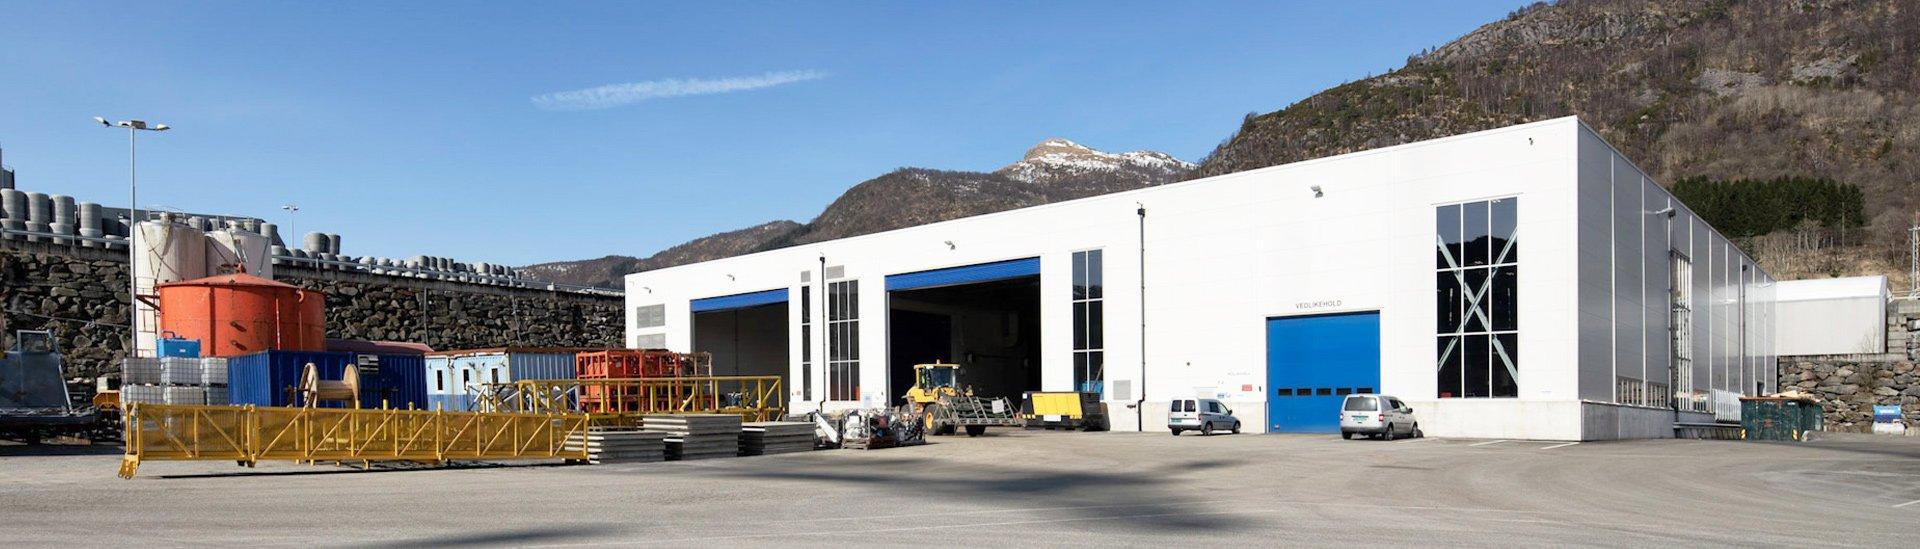 Production building LLENTAB